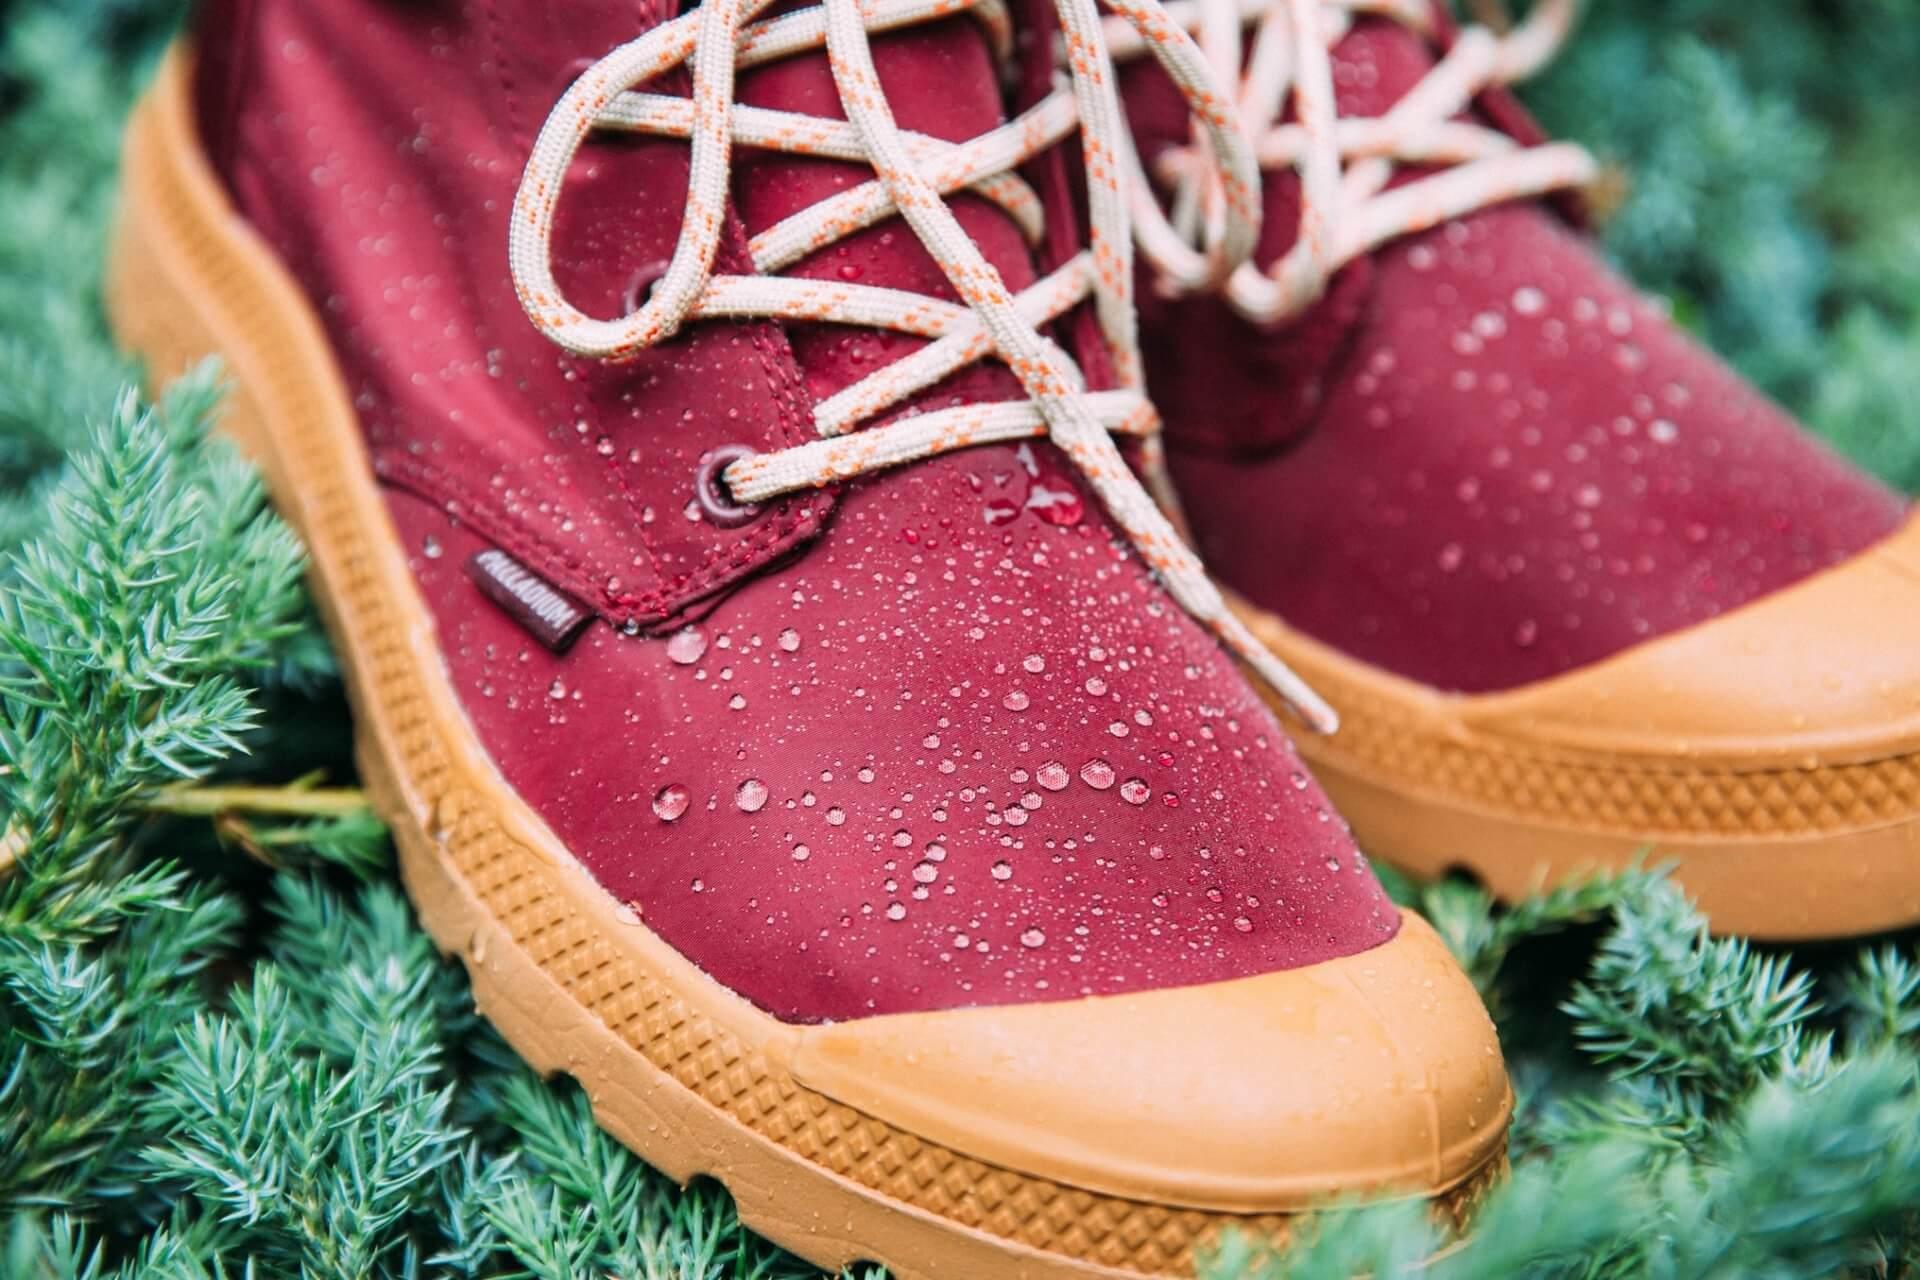 PALLADIUM徹底解剖|雨の日やアウトドア/フェスで大活躍するおしゃれな防水靴の秘密 life-fashion190704-palladium-10